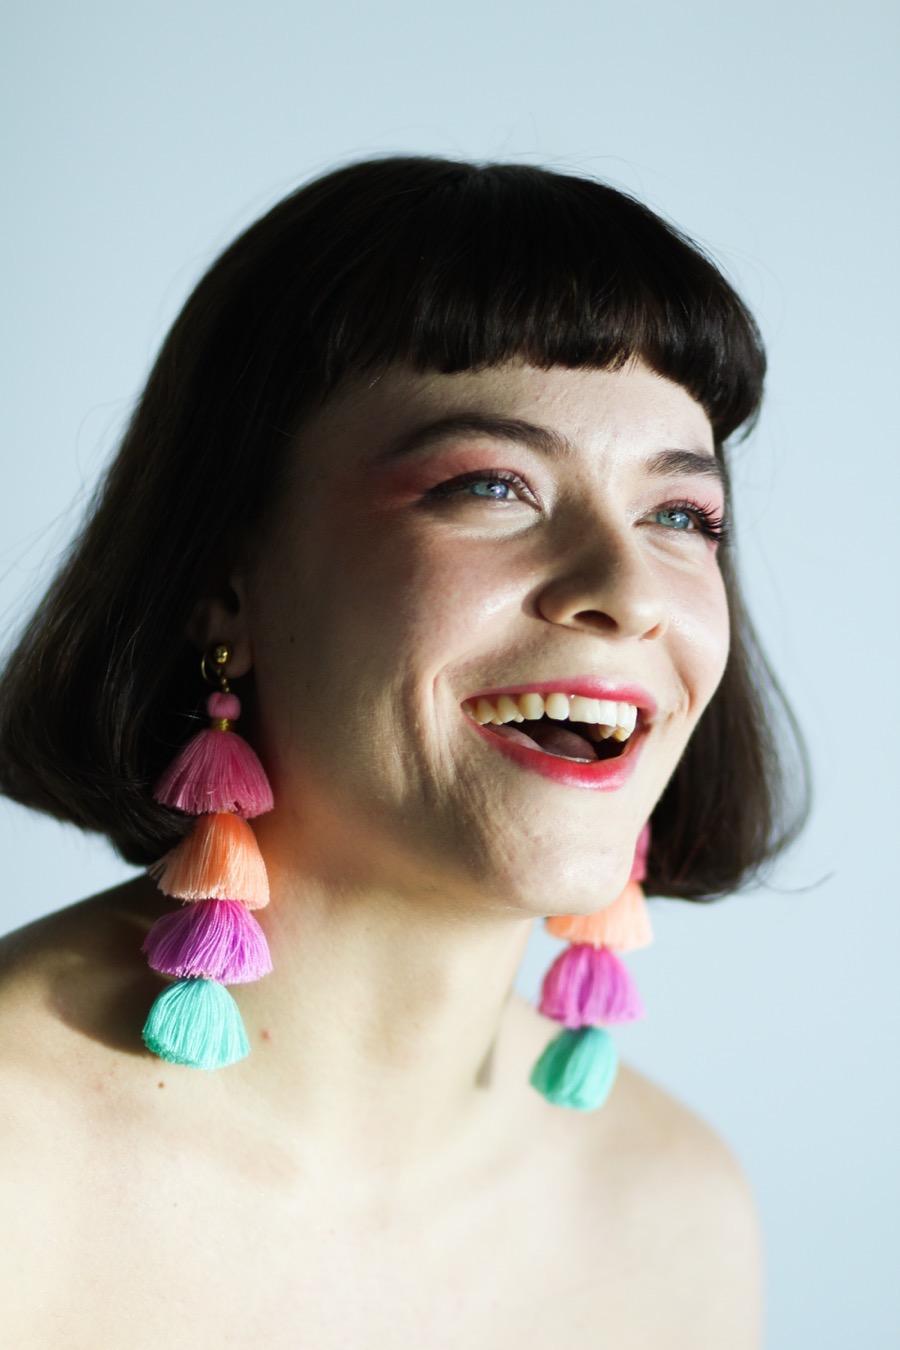 myrainbowtee-earrings-photo-marie-my-17